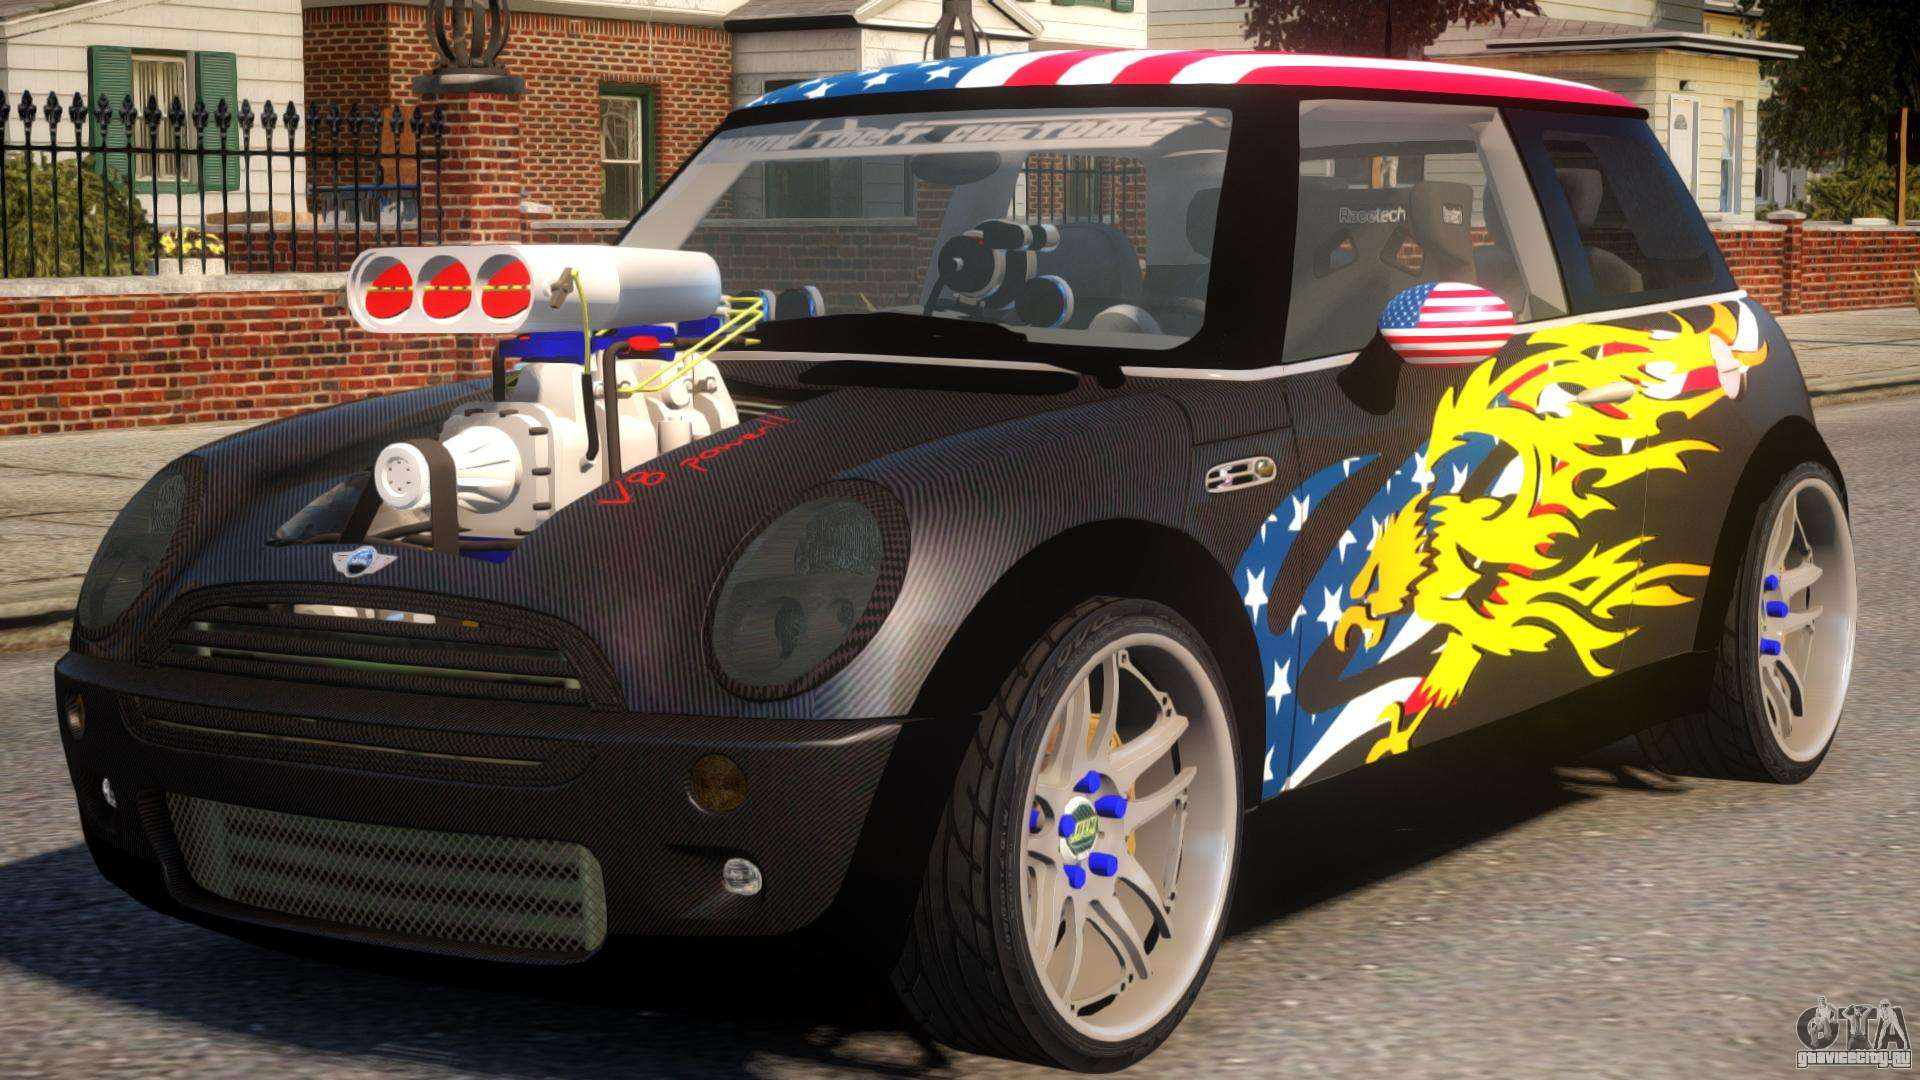 Mini Cooper S V8 Usa для Gta 4